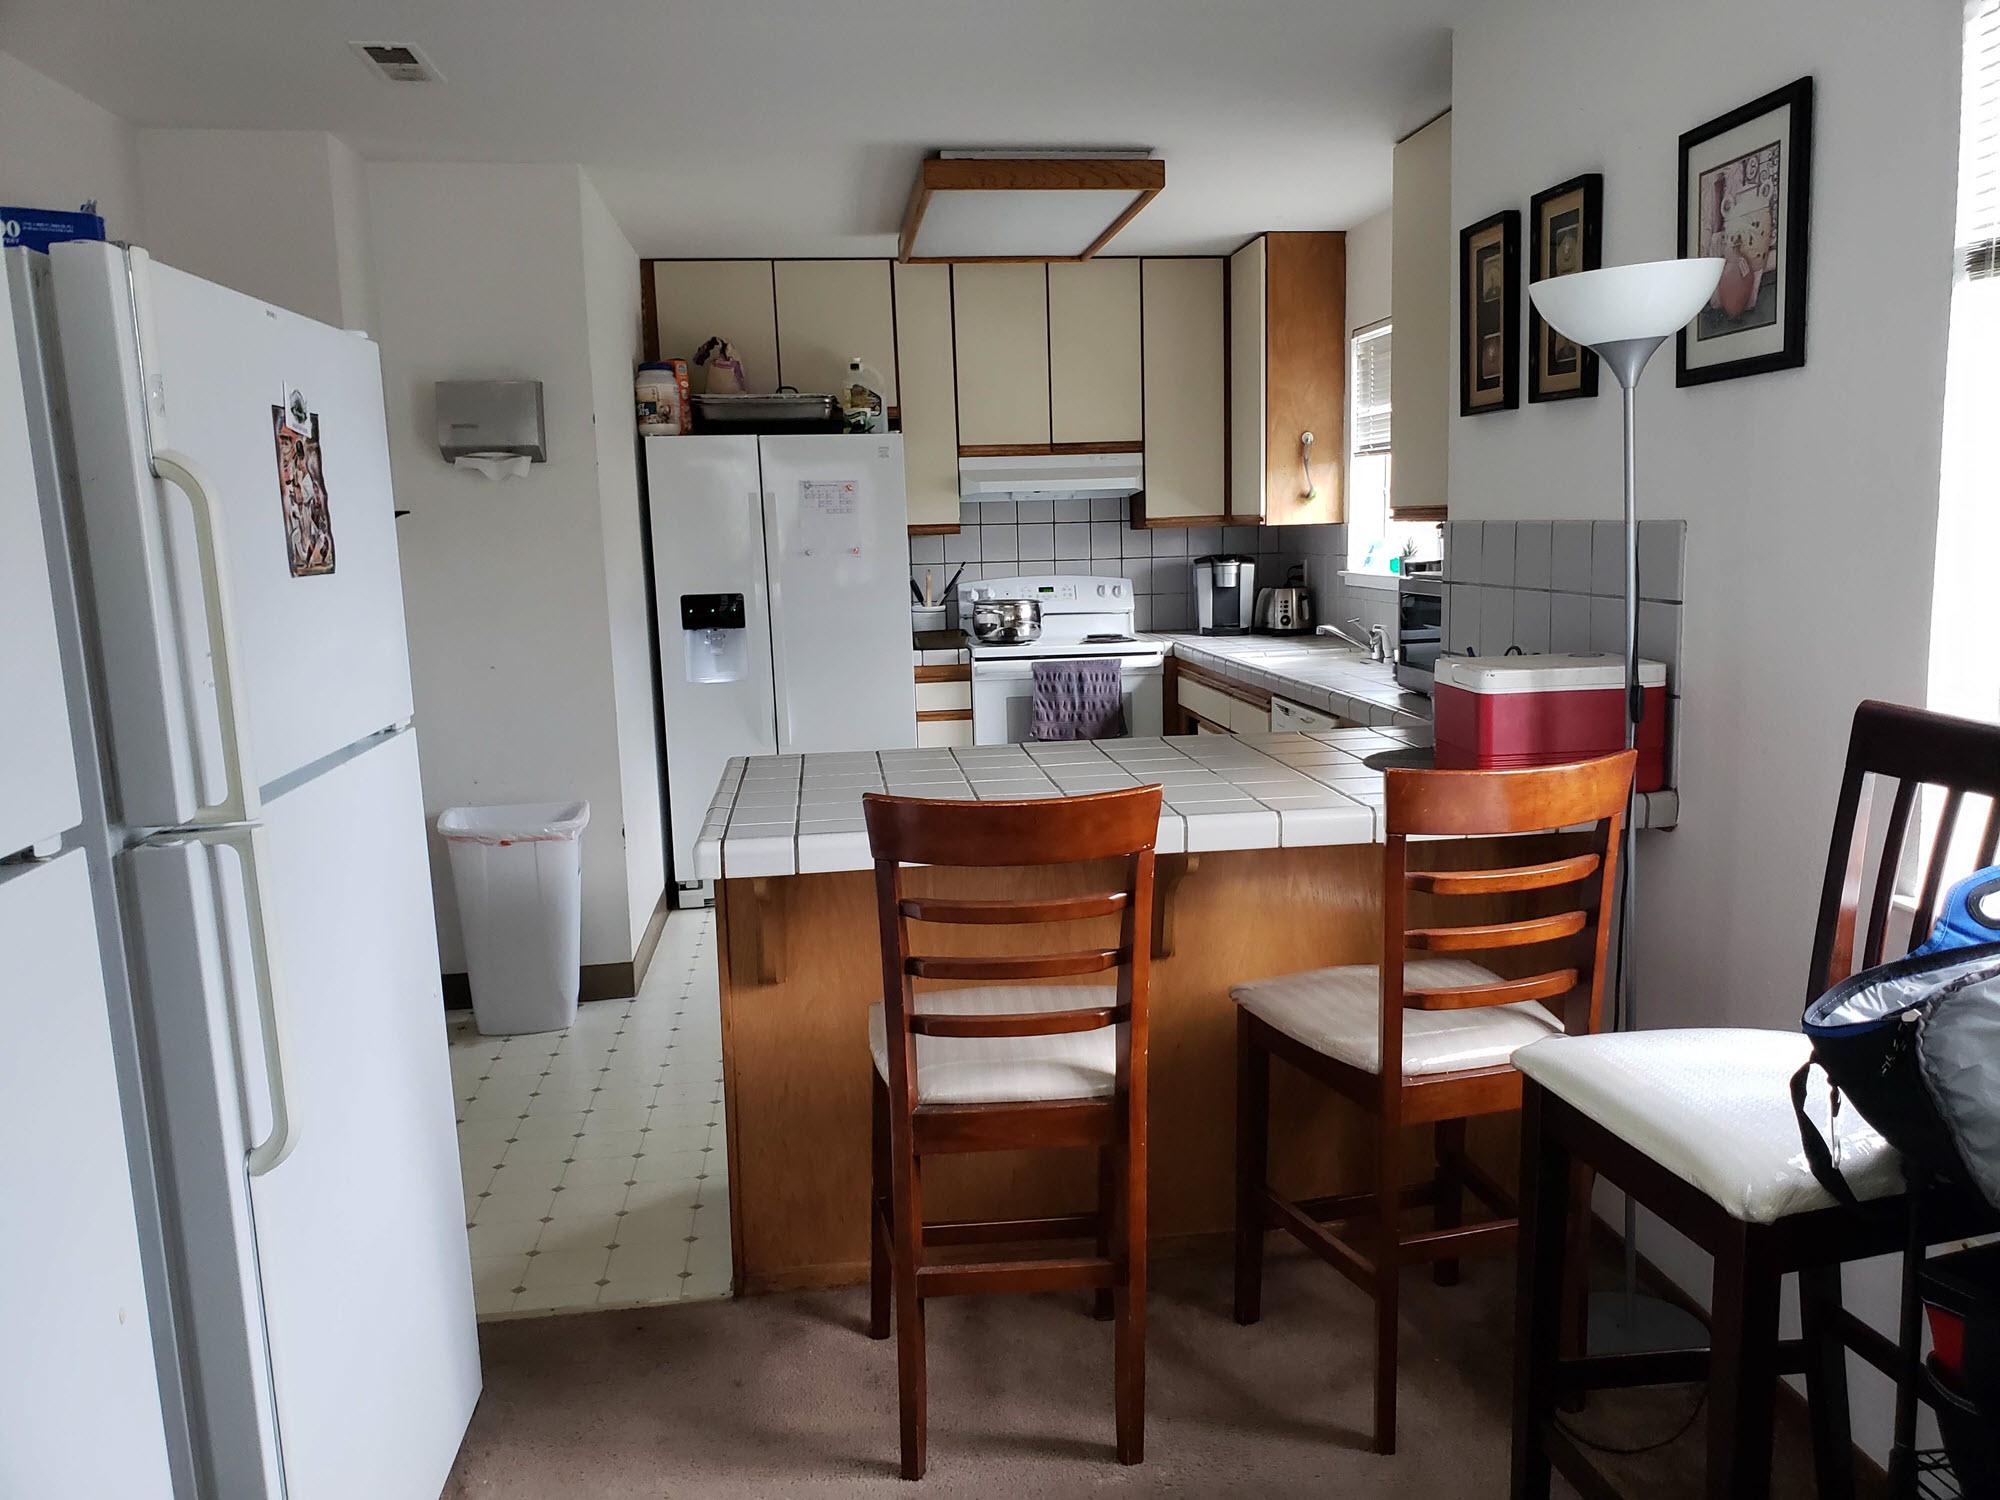 Eldorado Sober Living Homes in San Mateo, California with Upscale Kitchens